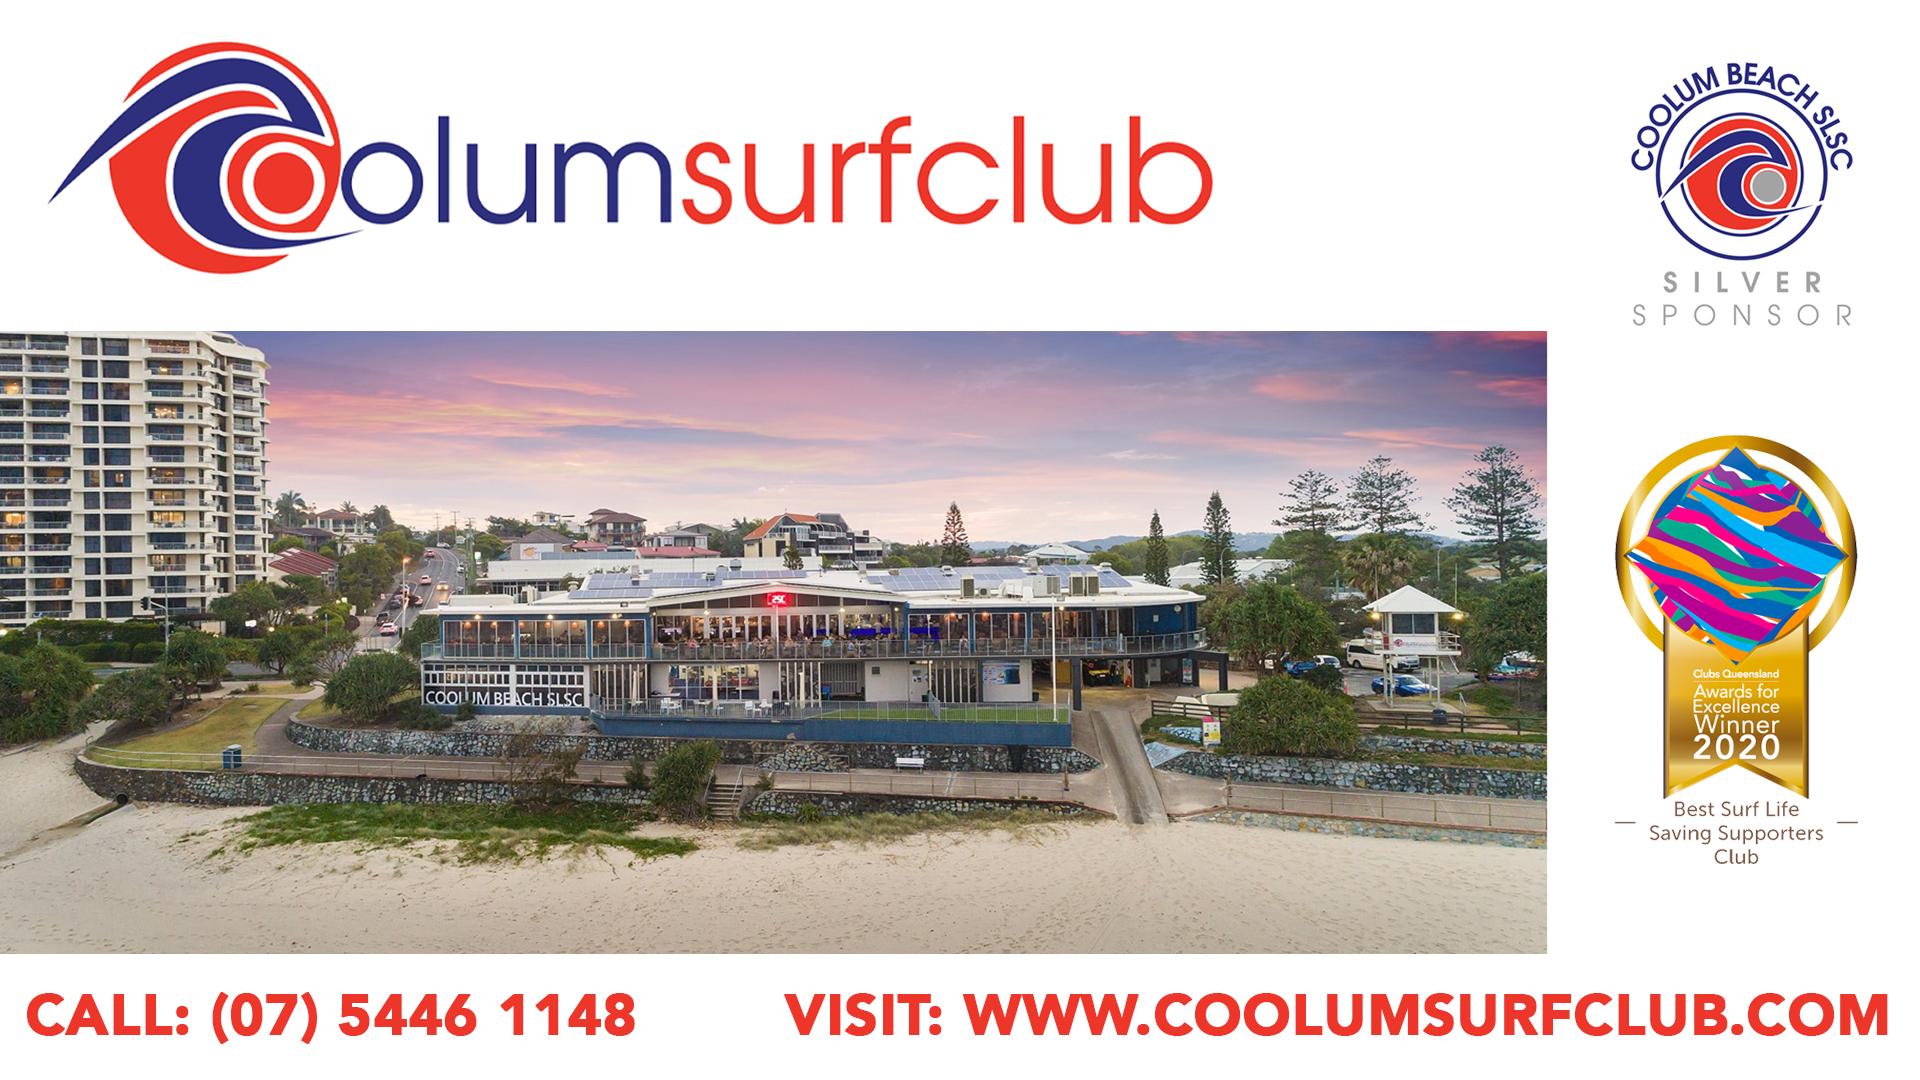 coolumsurfclub